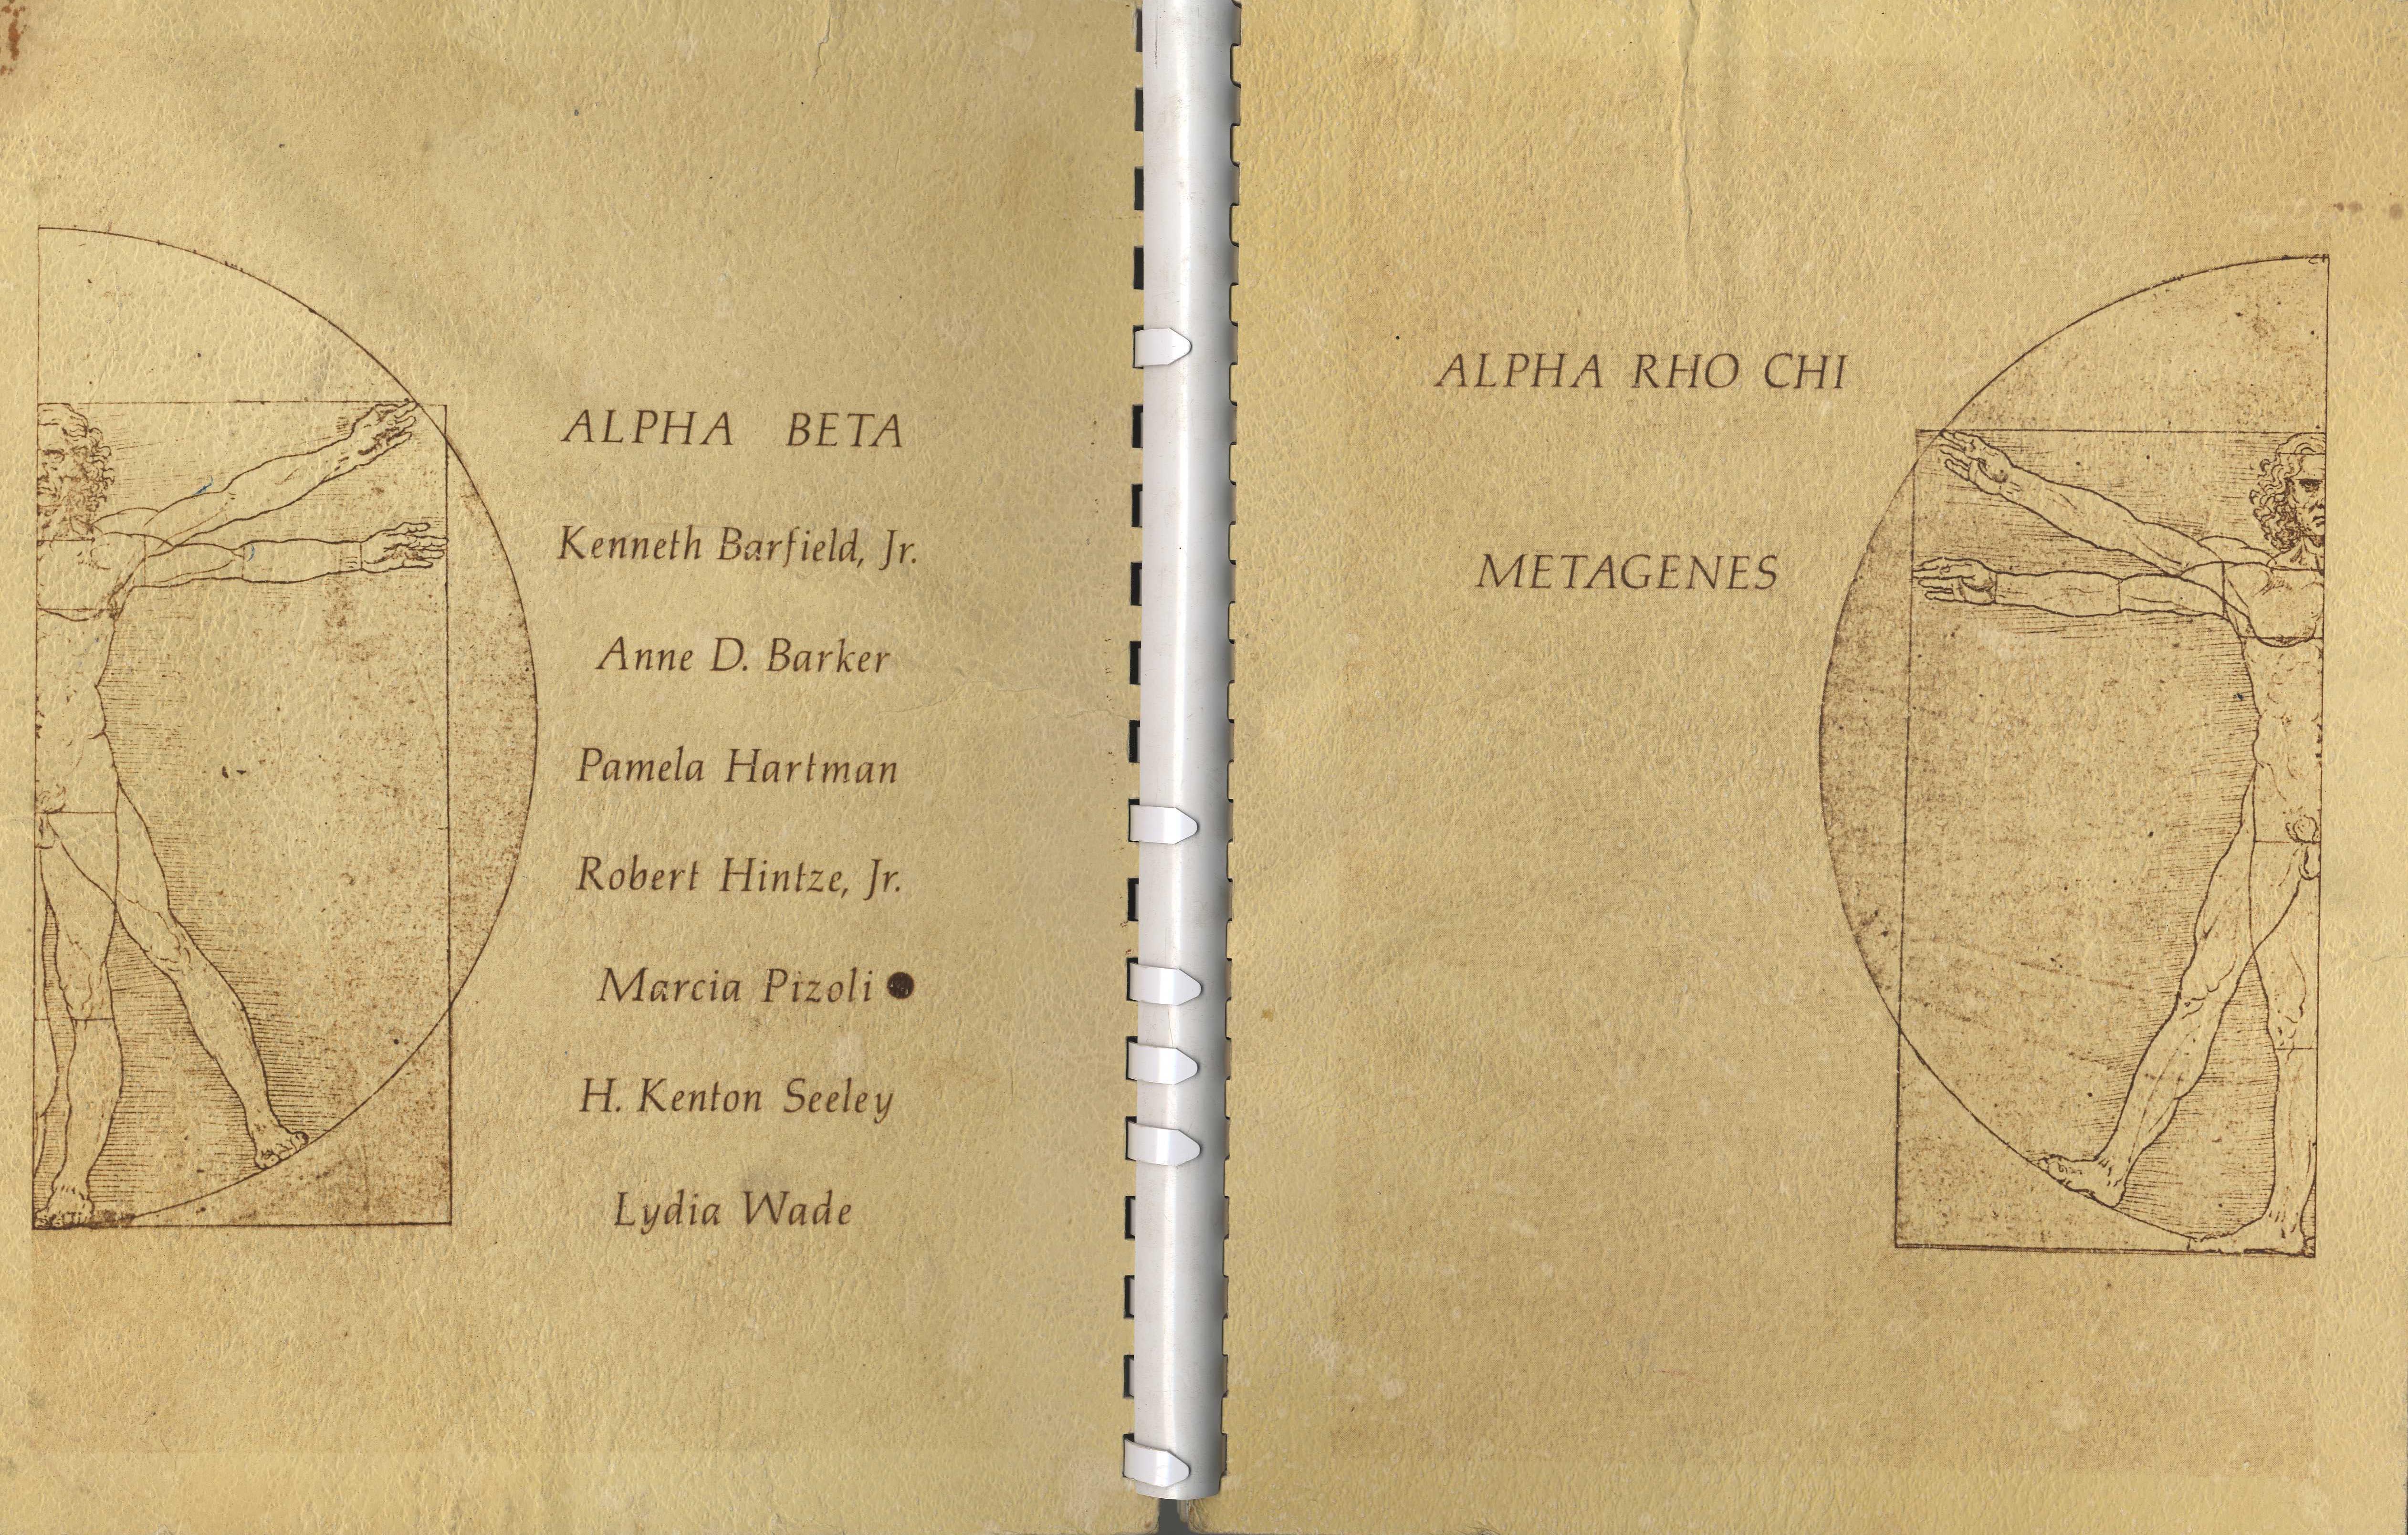 pledgebook-1981-AlphaBeta